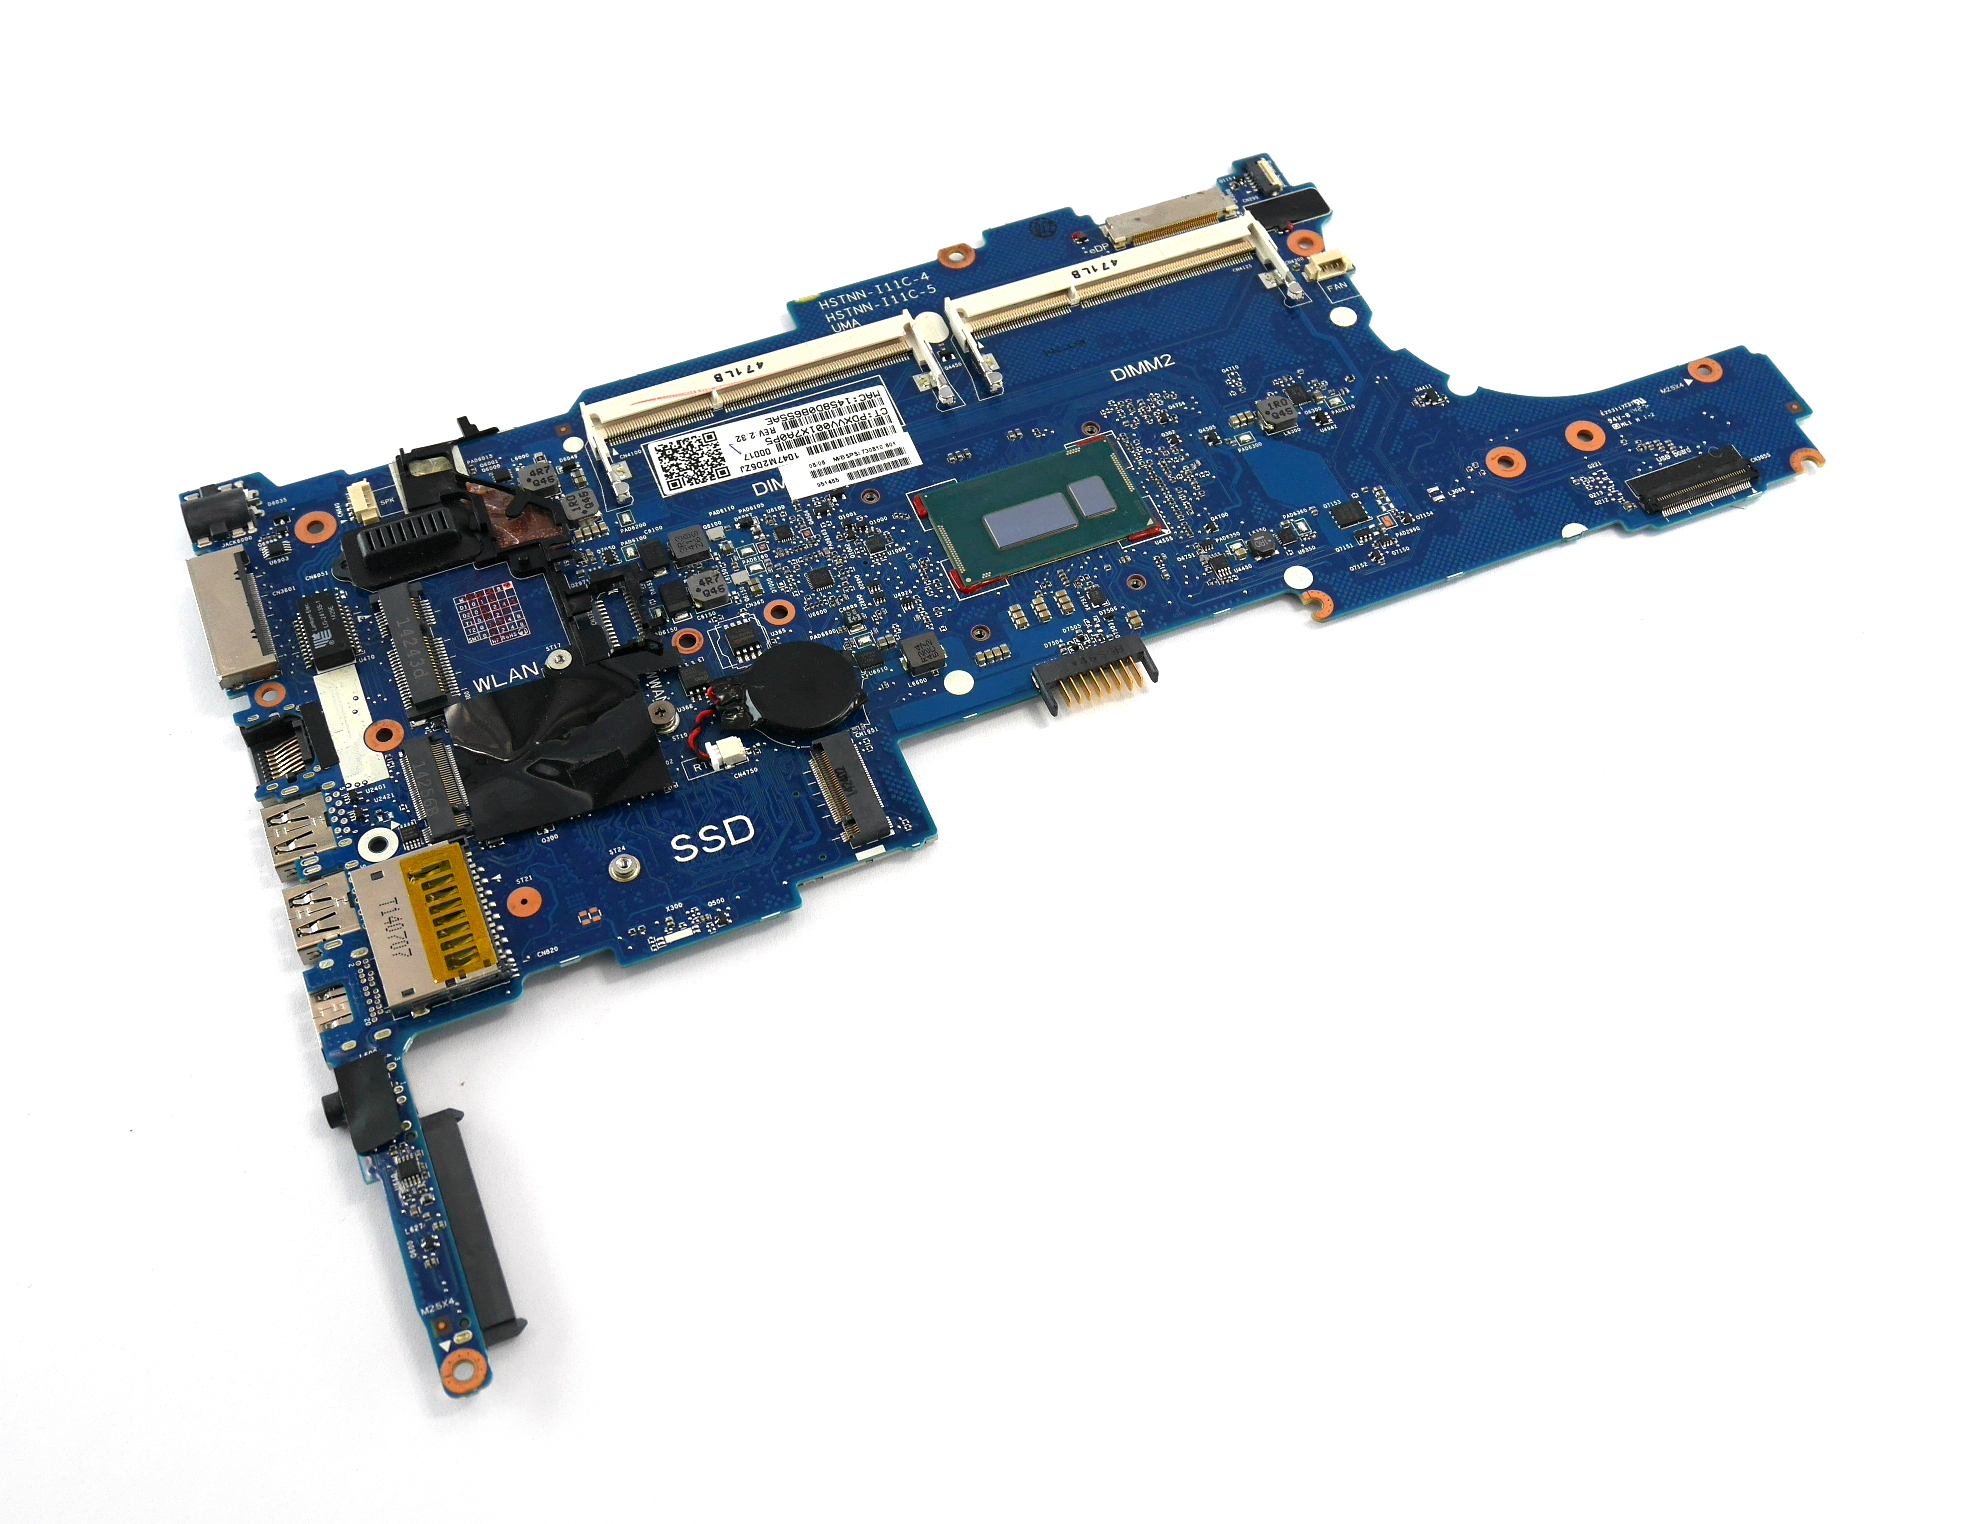 HP 730810-601 EliteBook 840 Motherboard with Intel Core i7-4600U Processor